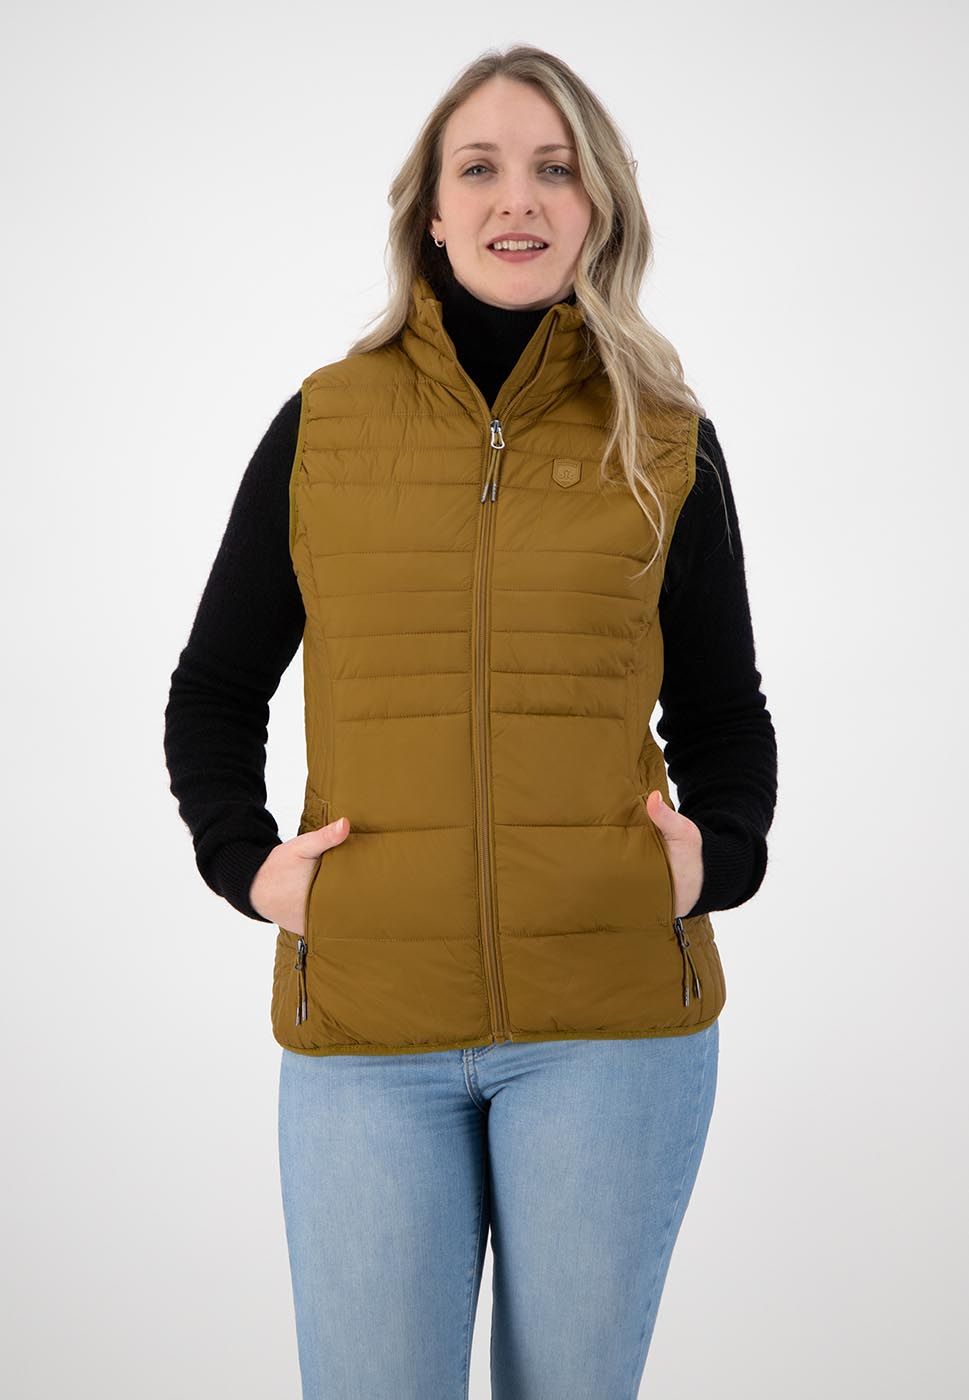 Kjelvik Scandinavian Clothing - Women Bodywarmers Denise Golden yellow